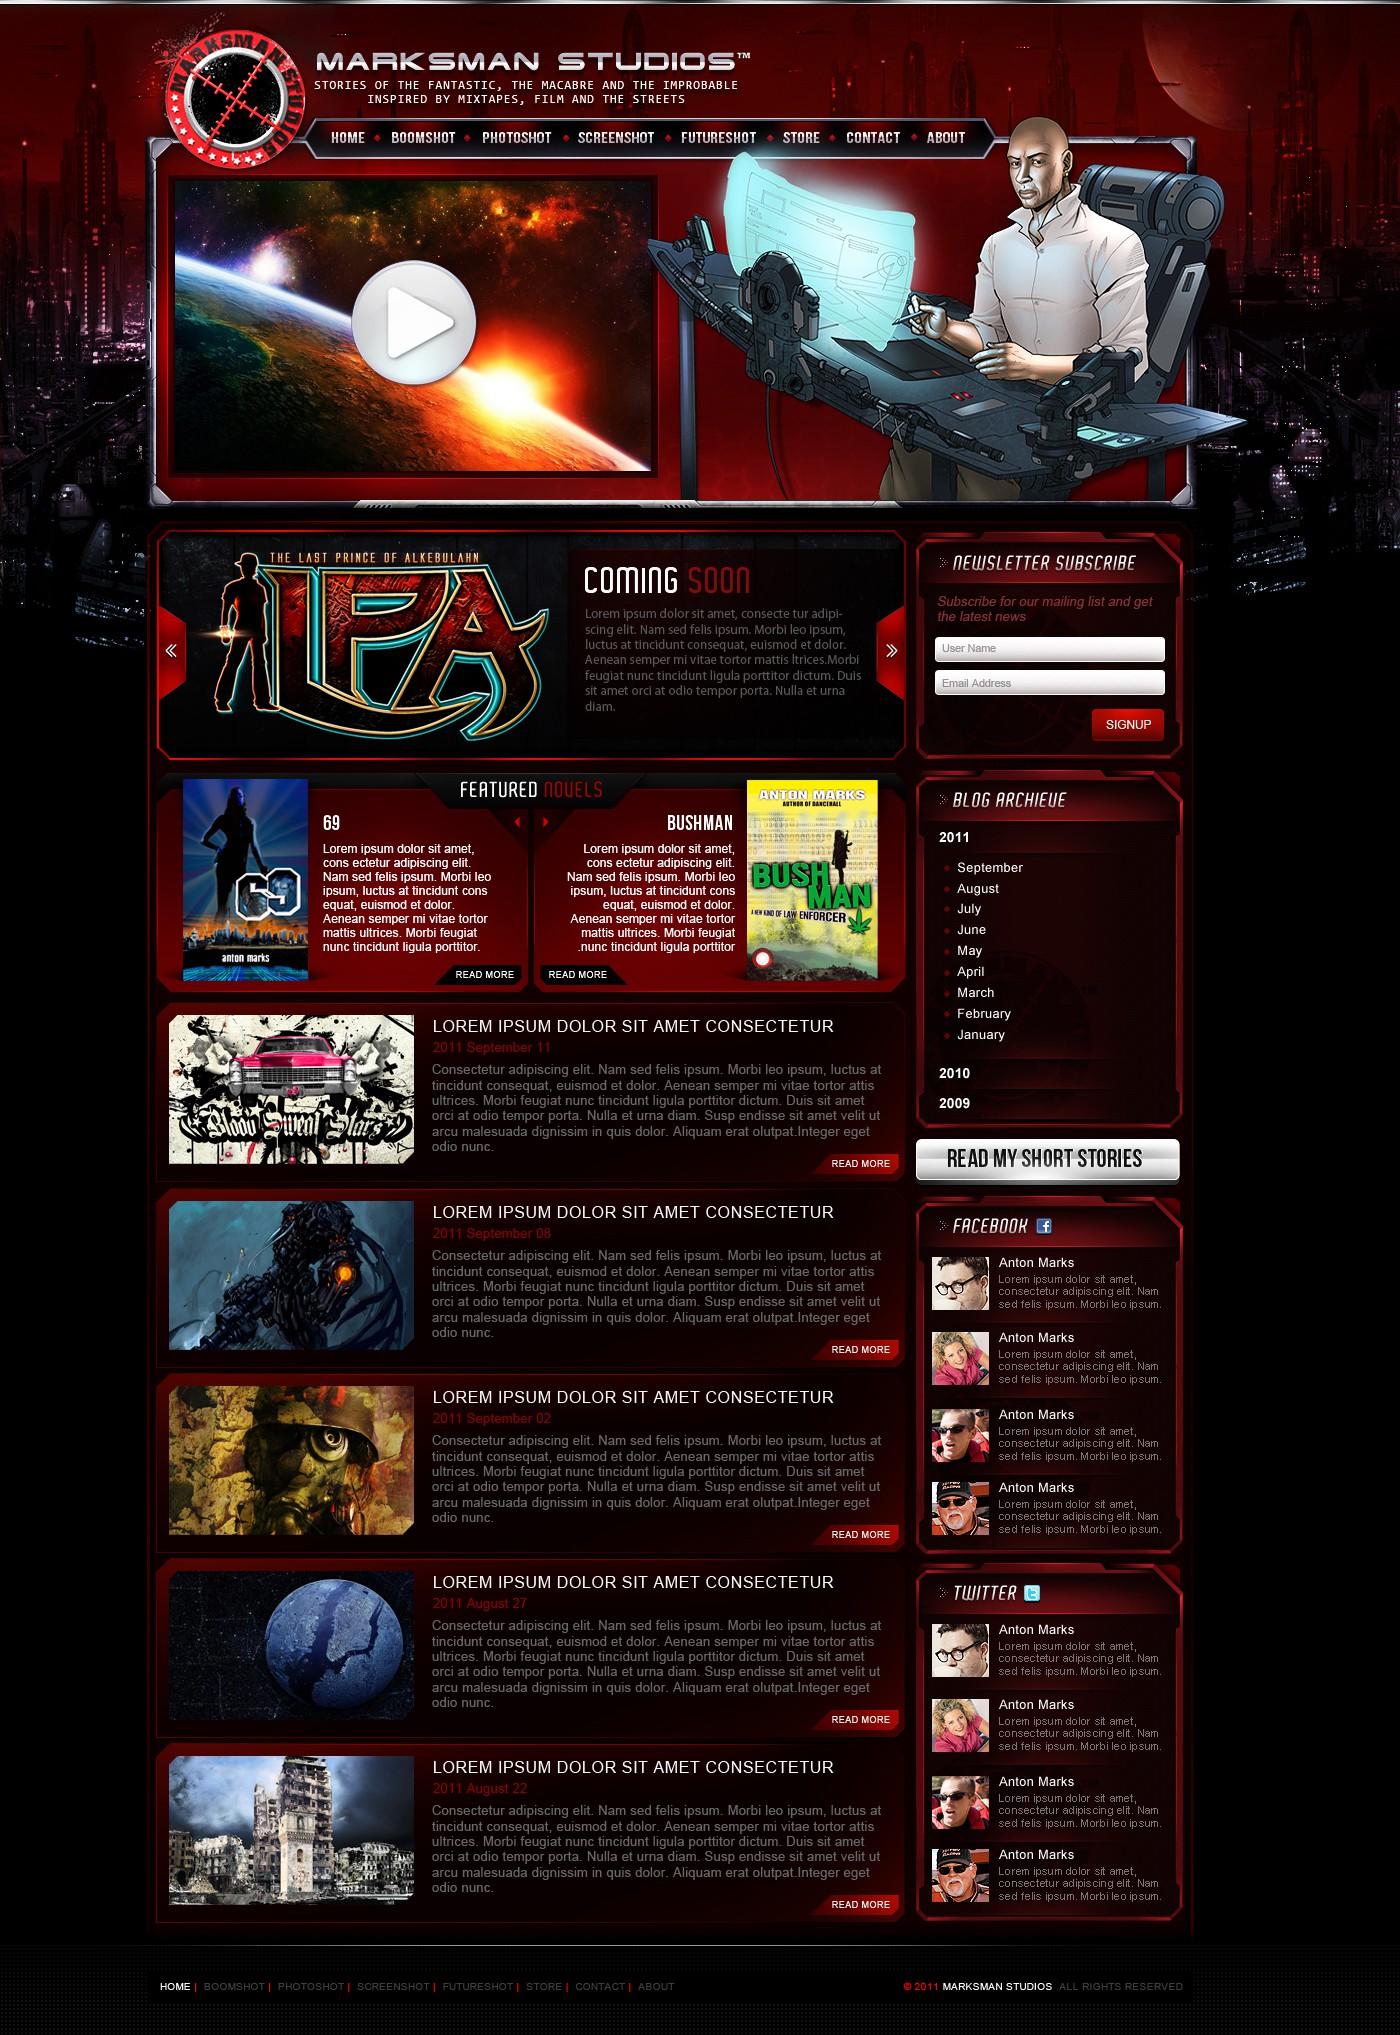 Create the next website design for Marksman Studios